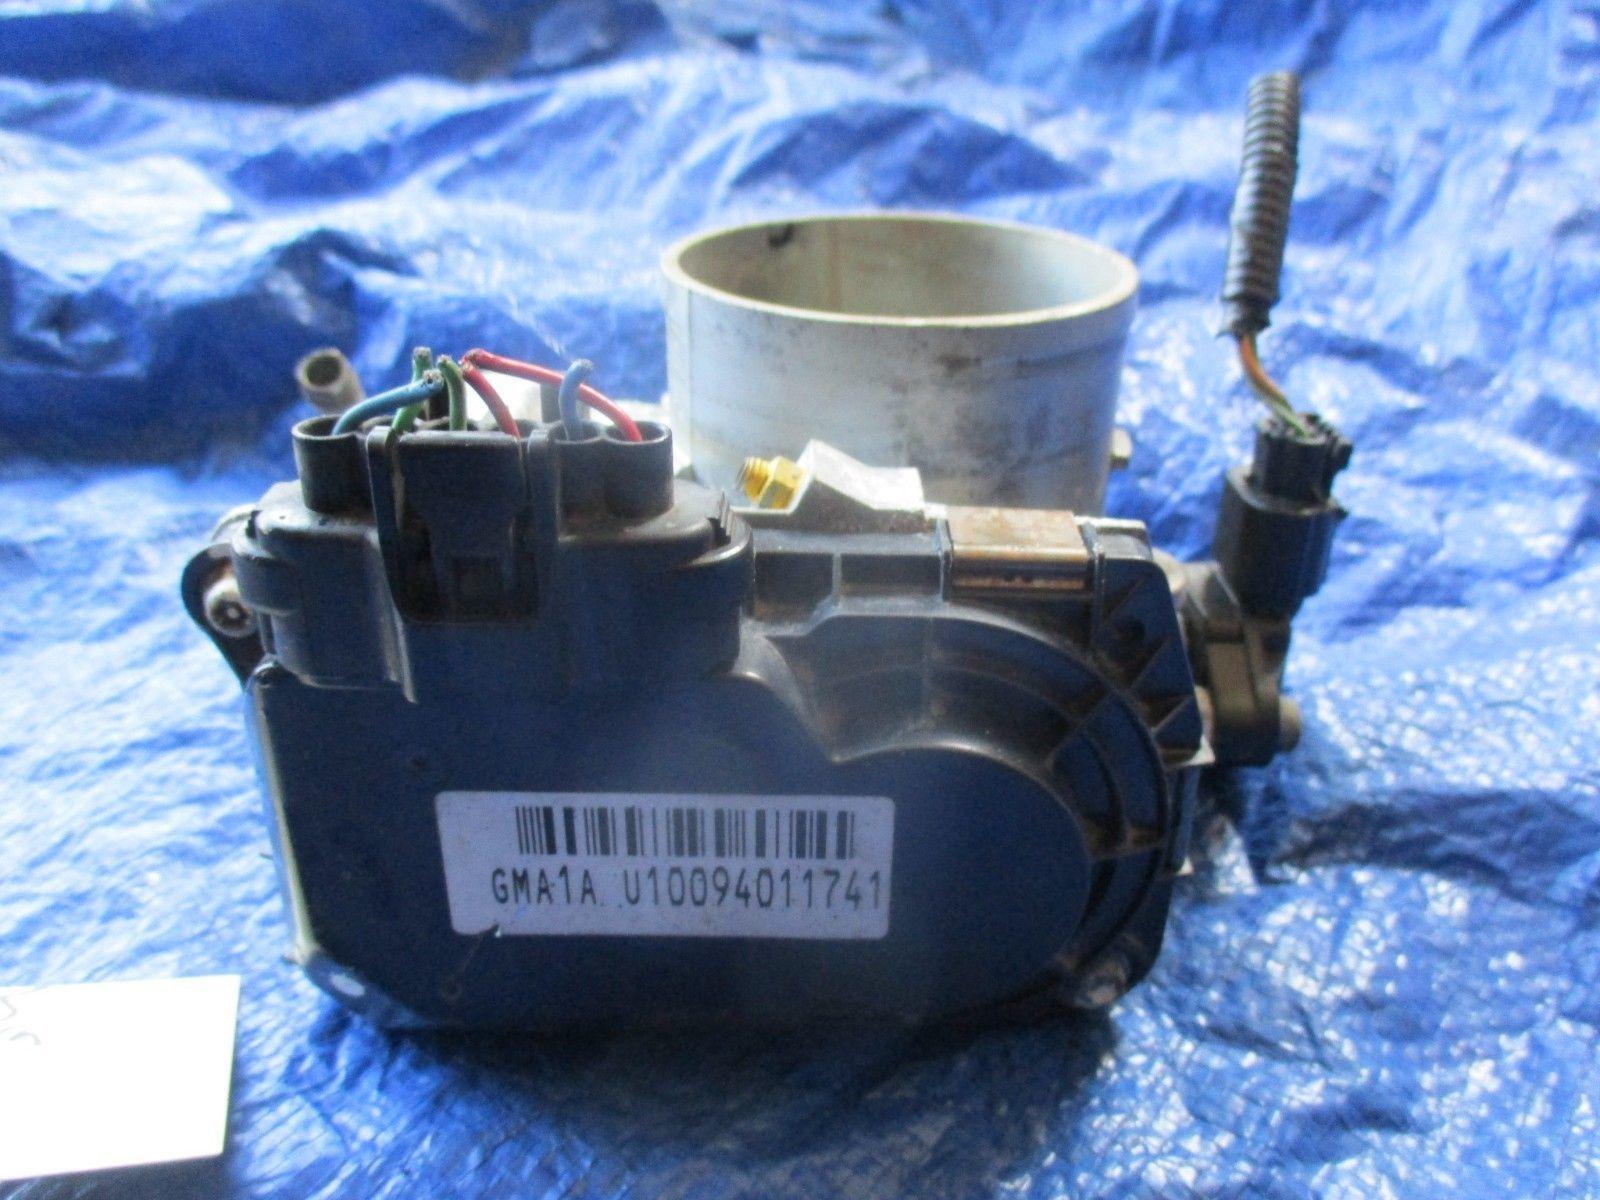 04-06 Acura TL J32A3 VTEC throttle body assembly engine motor OEM RDA V6 GMA1A